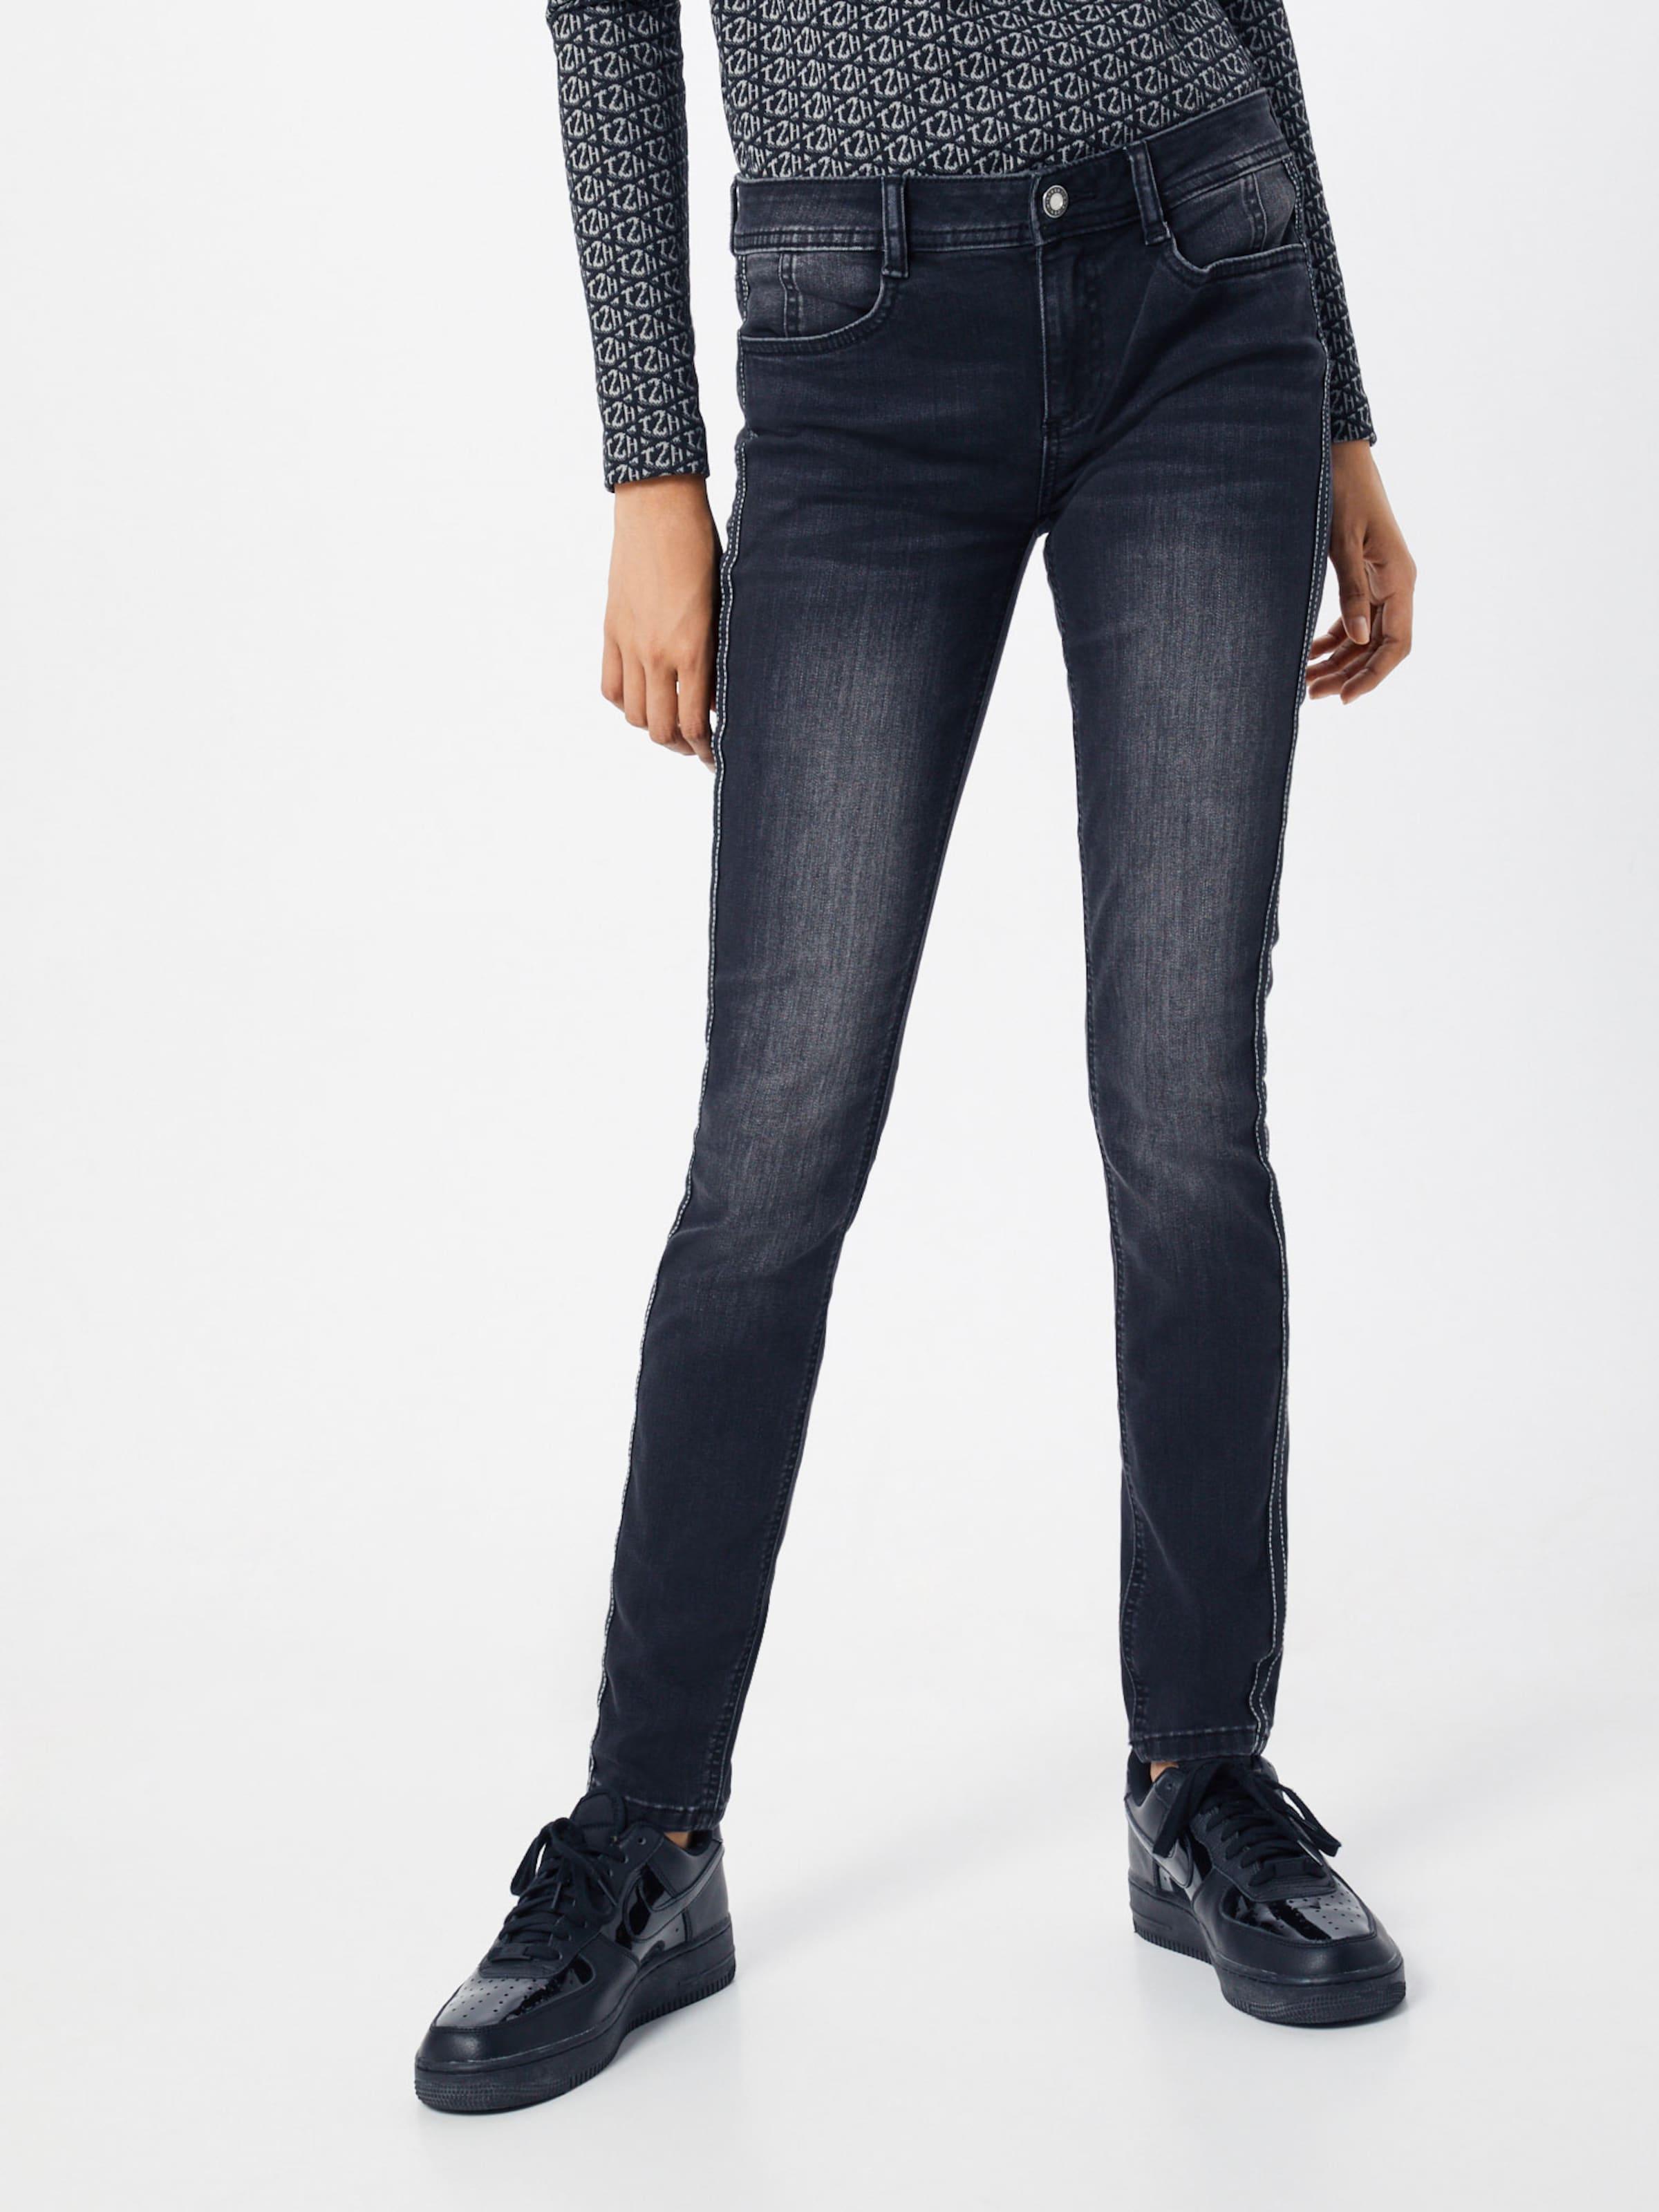 Black' Denim 'qr Black One Jeans Street York In 6gyfIvYb7